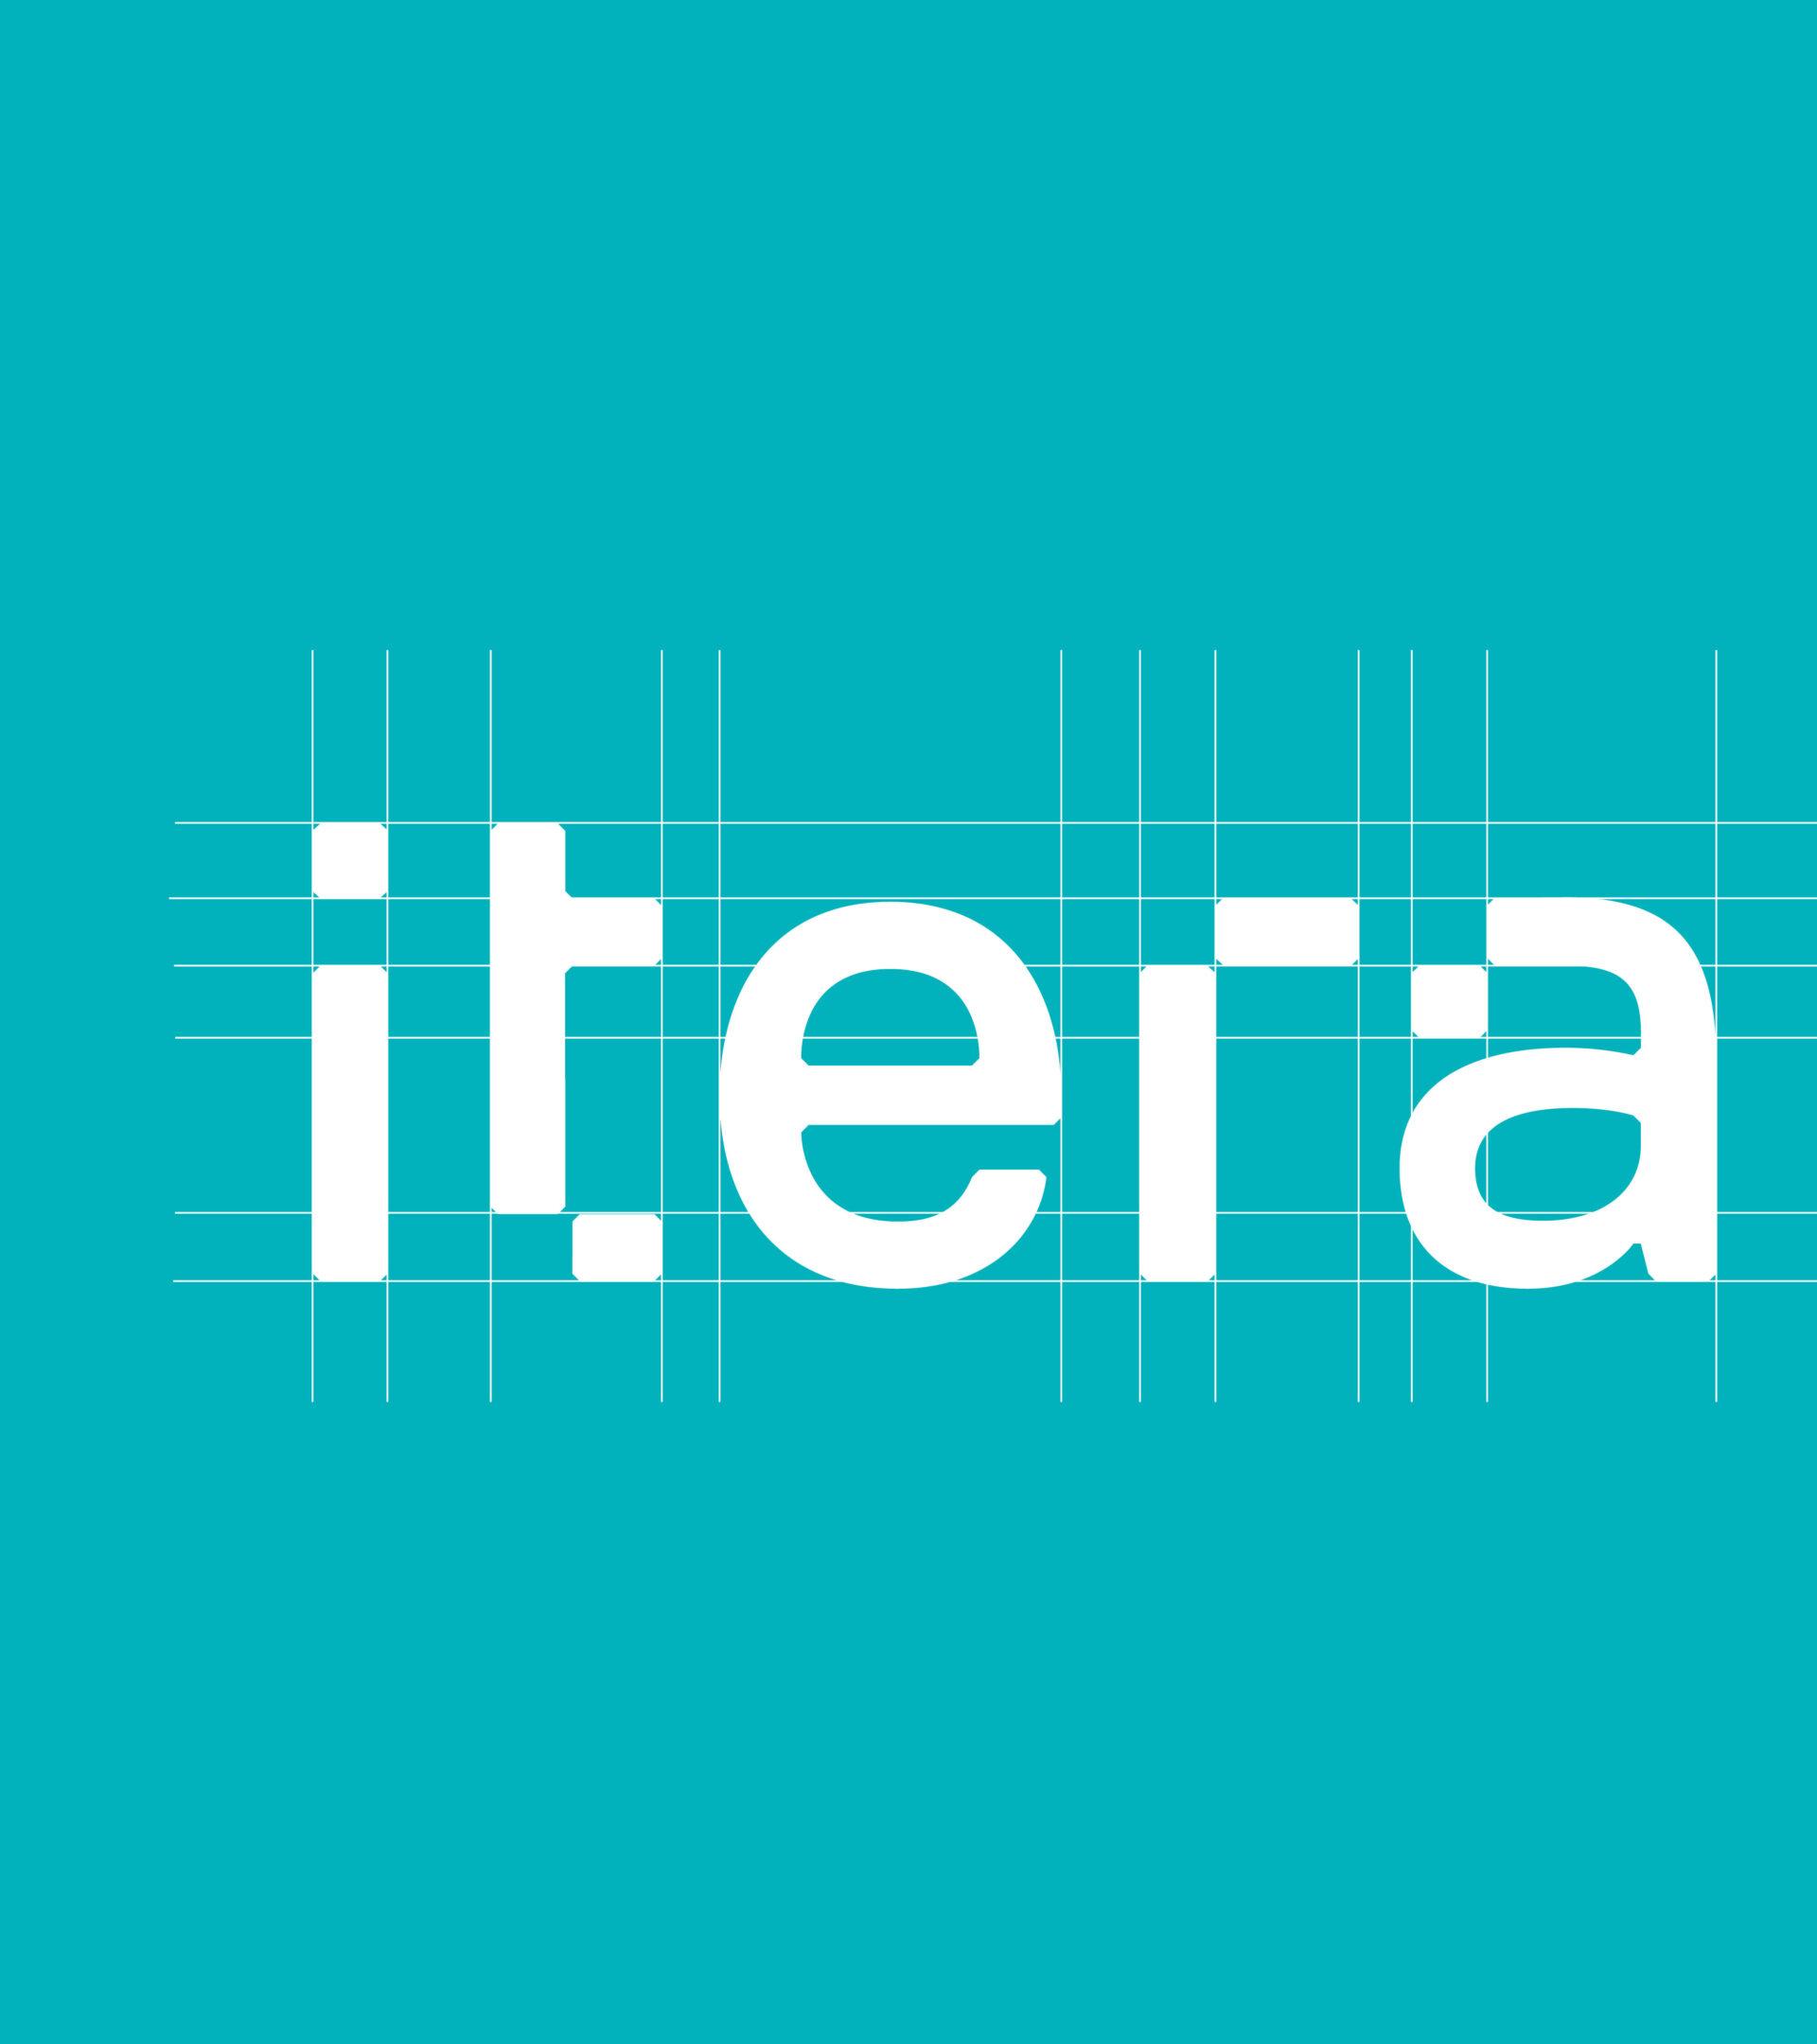 iteratec Logo im Raster